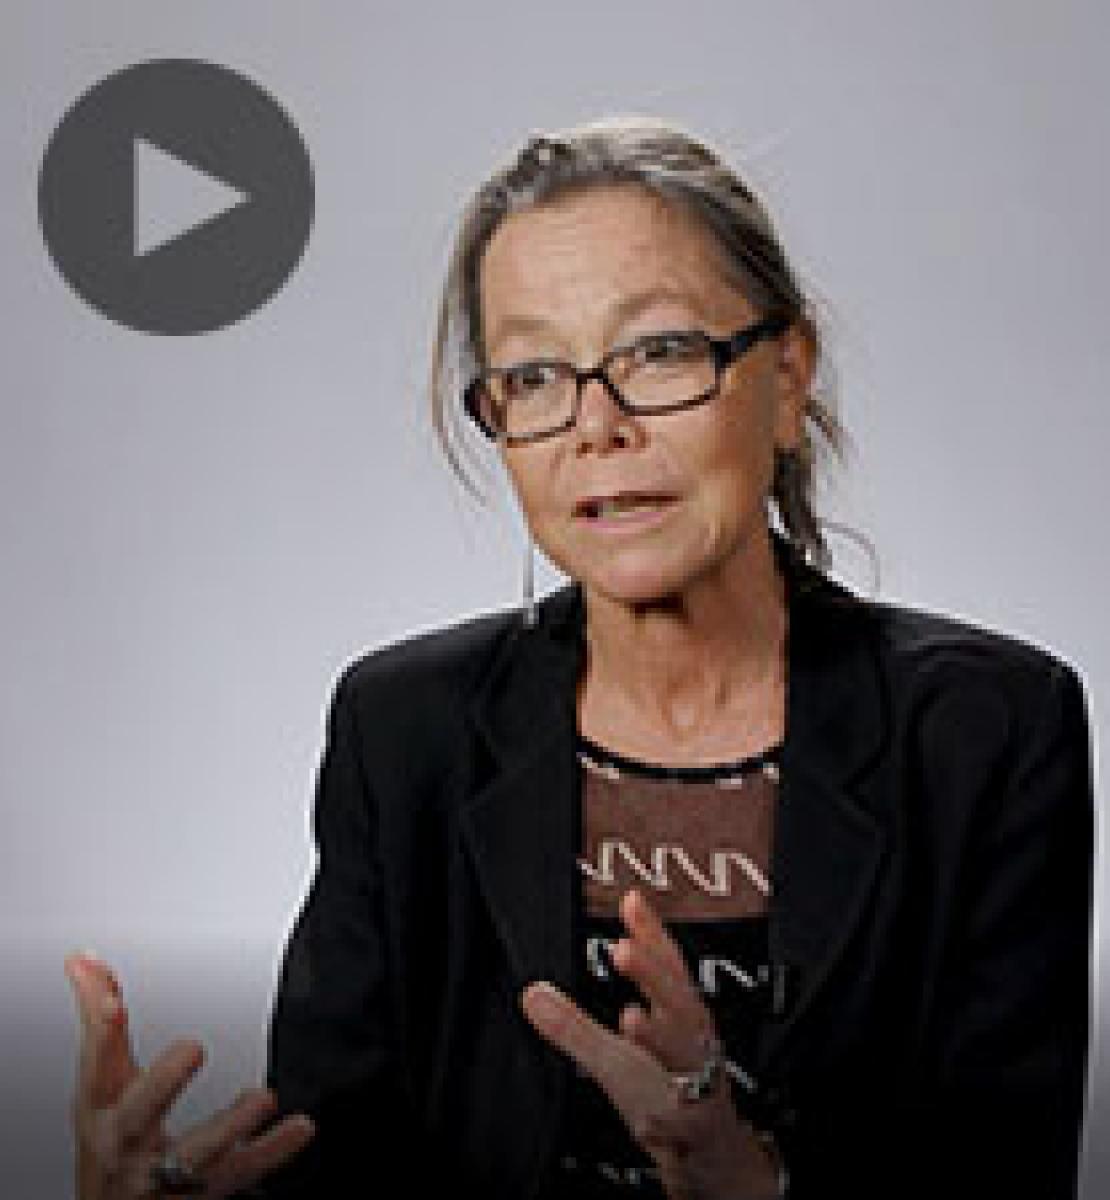 Screenshot from video message shows Resident Coordinator, Ulrika Richardson